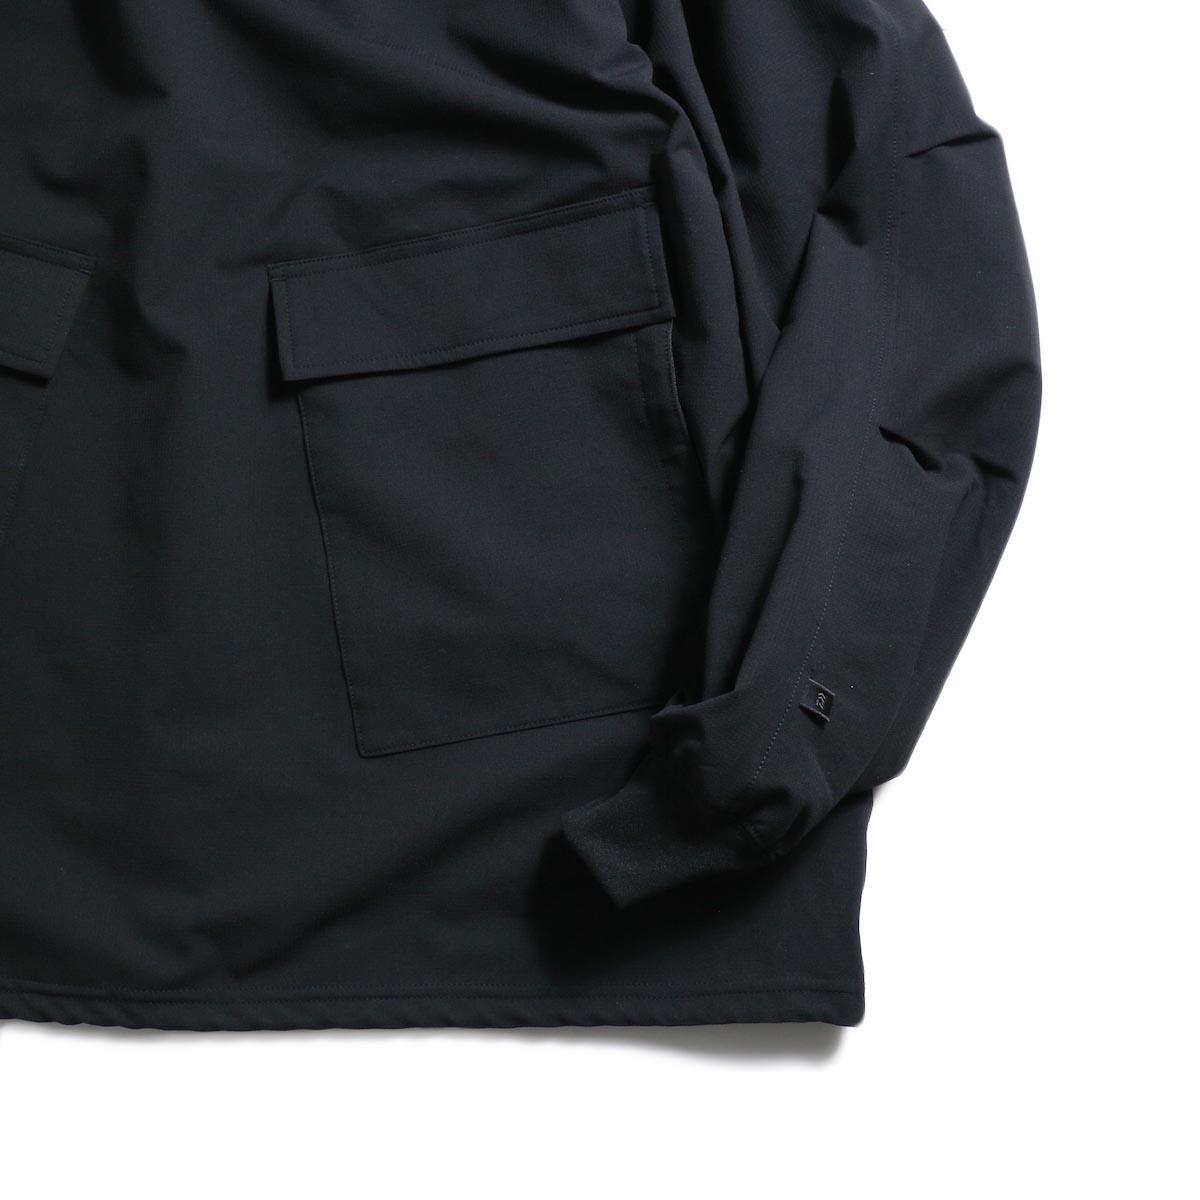 DAIWA PIER39 / Pull Over Snow Parka (Black)袖、裾